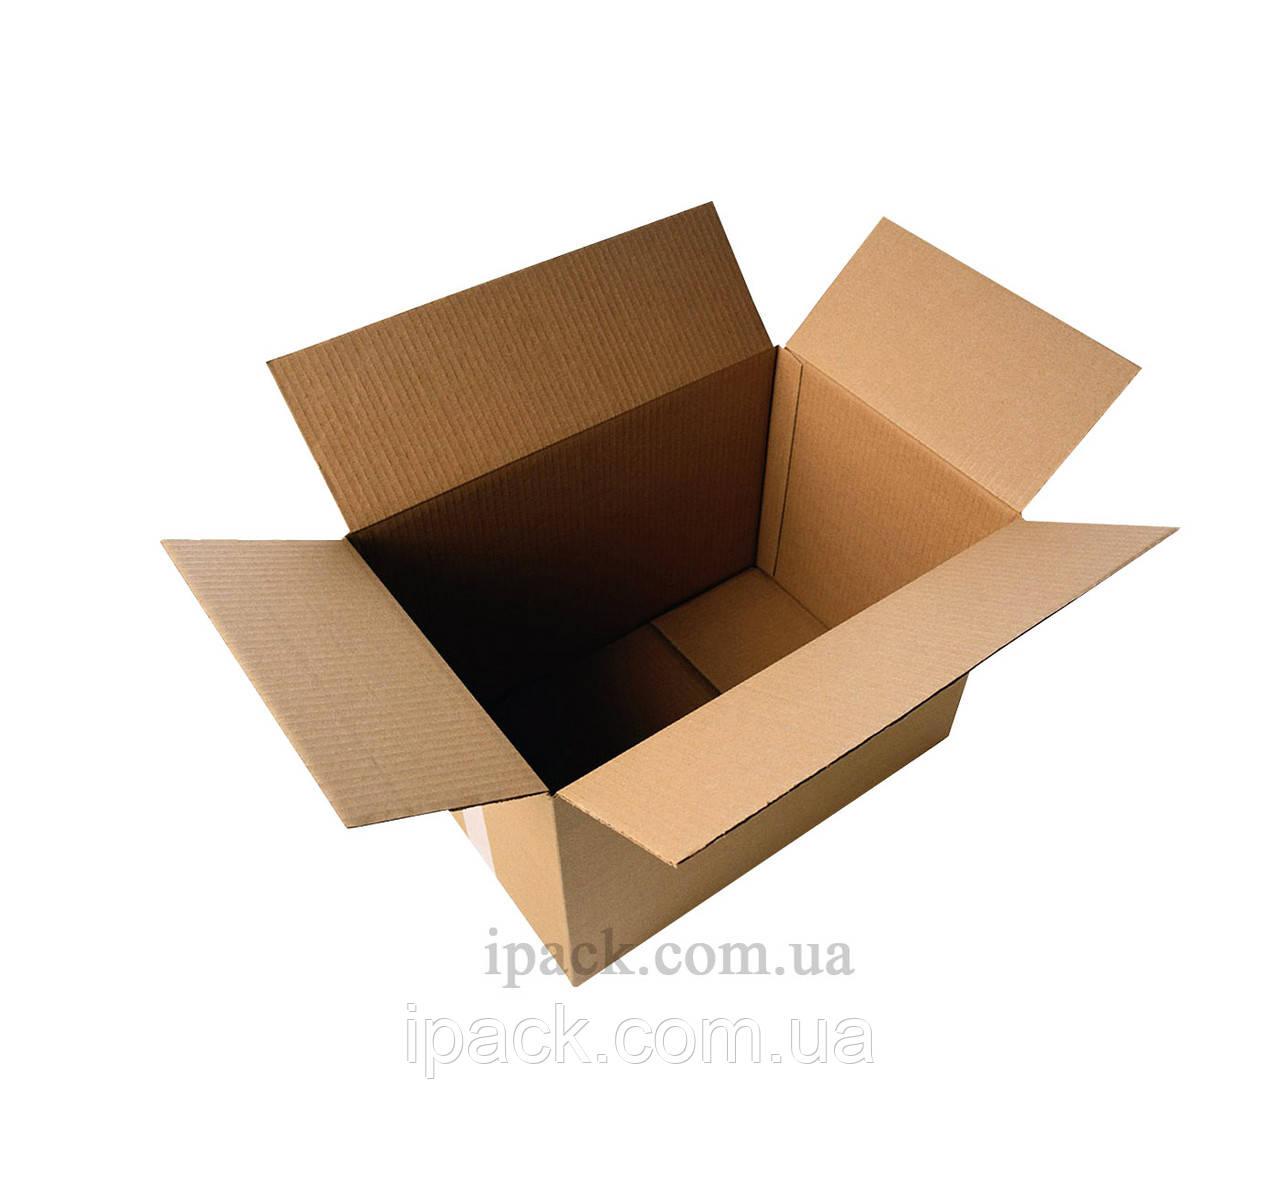 Гофроящик 590*450*370 мм, бурый, четырехклапанный картонный короб